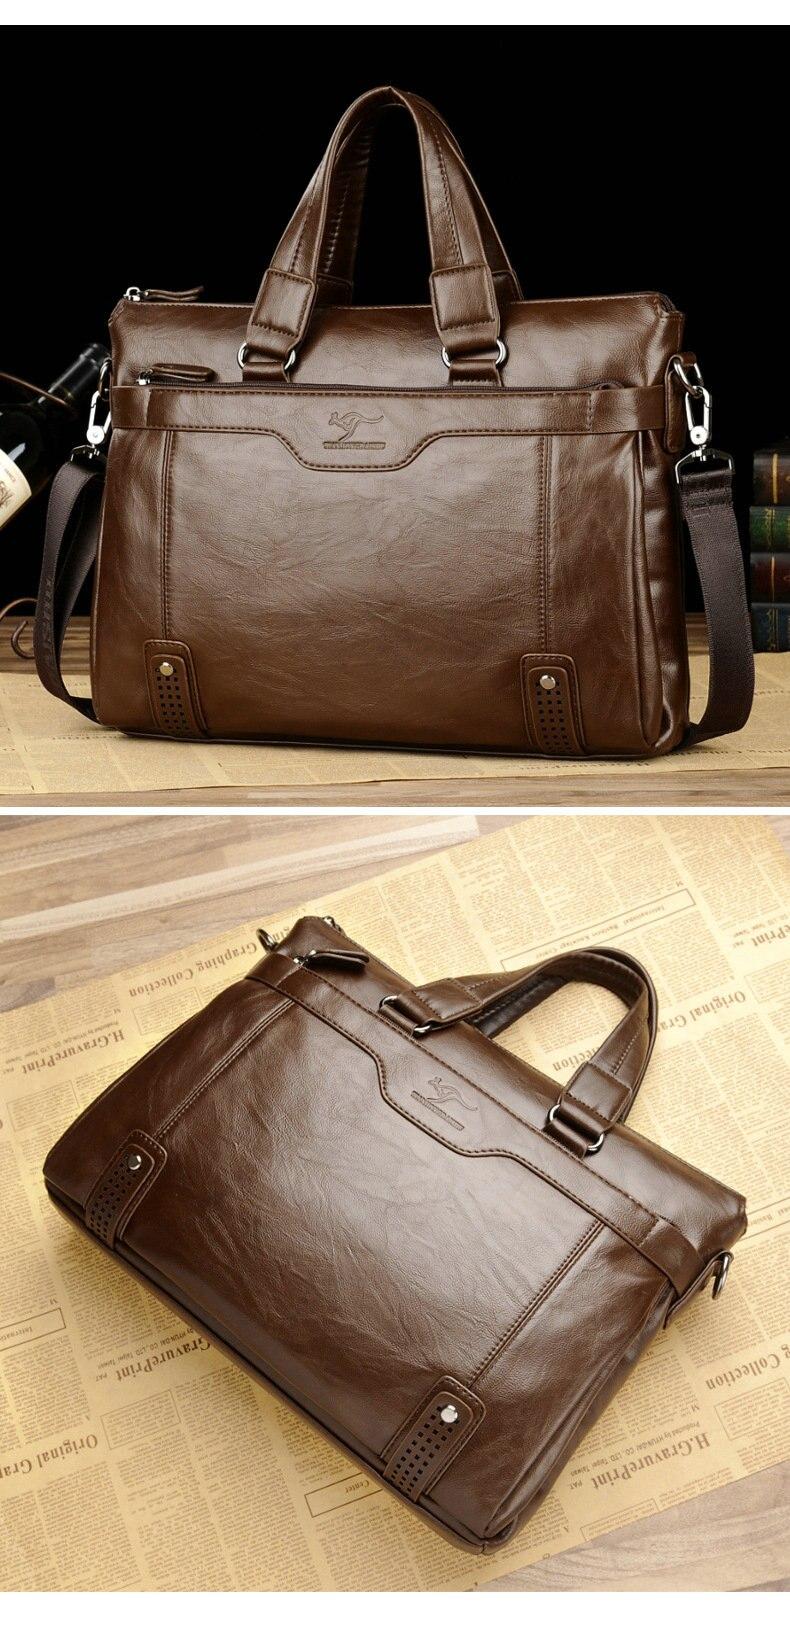 HTB10FFAek5E3KVjSZFCq6zuzXXaV Cowhide Leather men's Briefcase men laptop male messenger bag Men's shoulder bags briefcases for documents bag